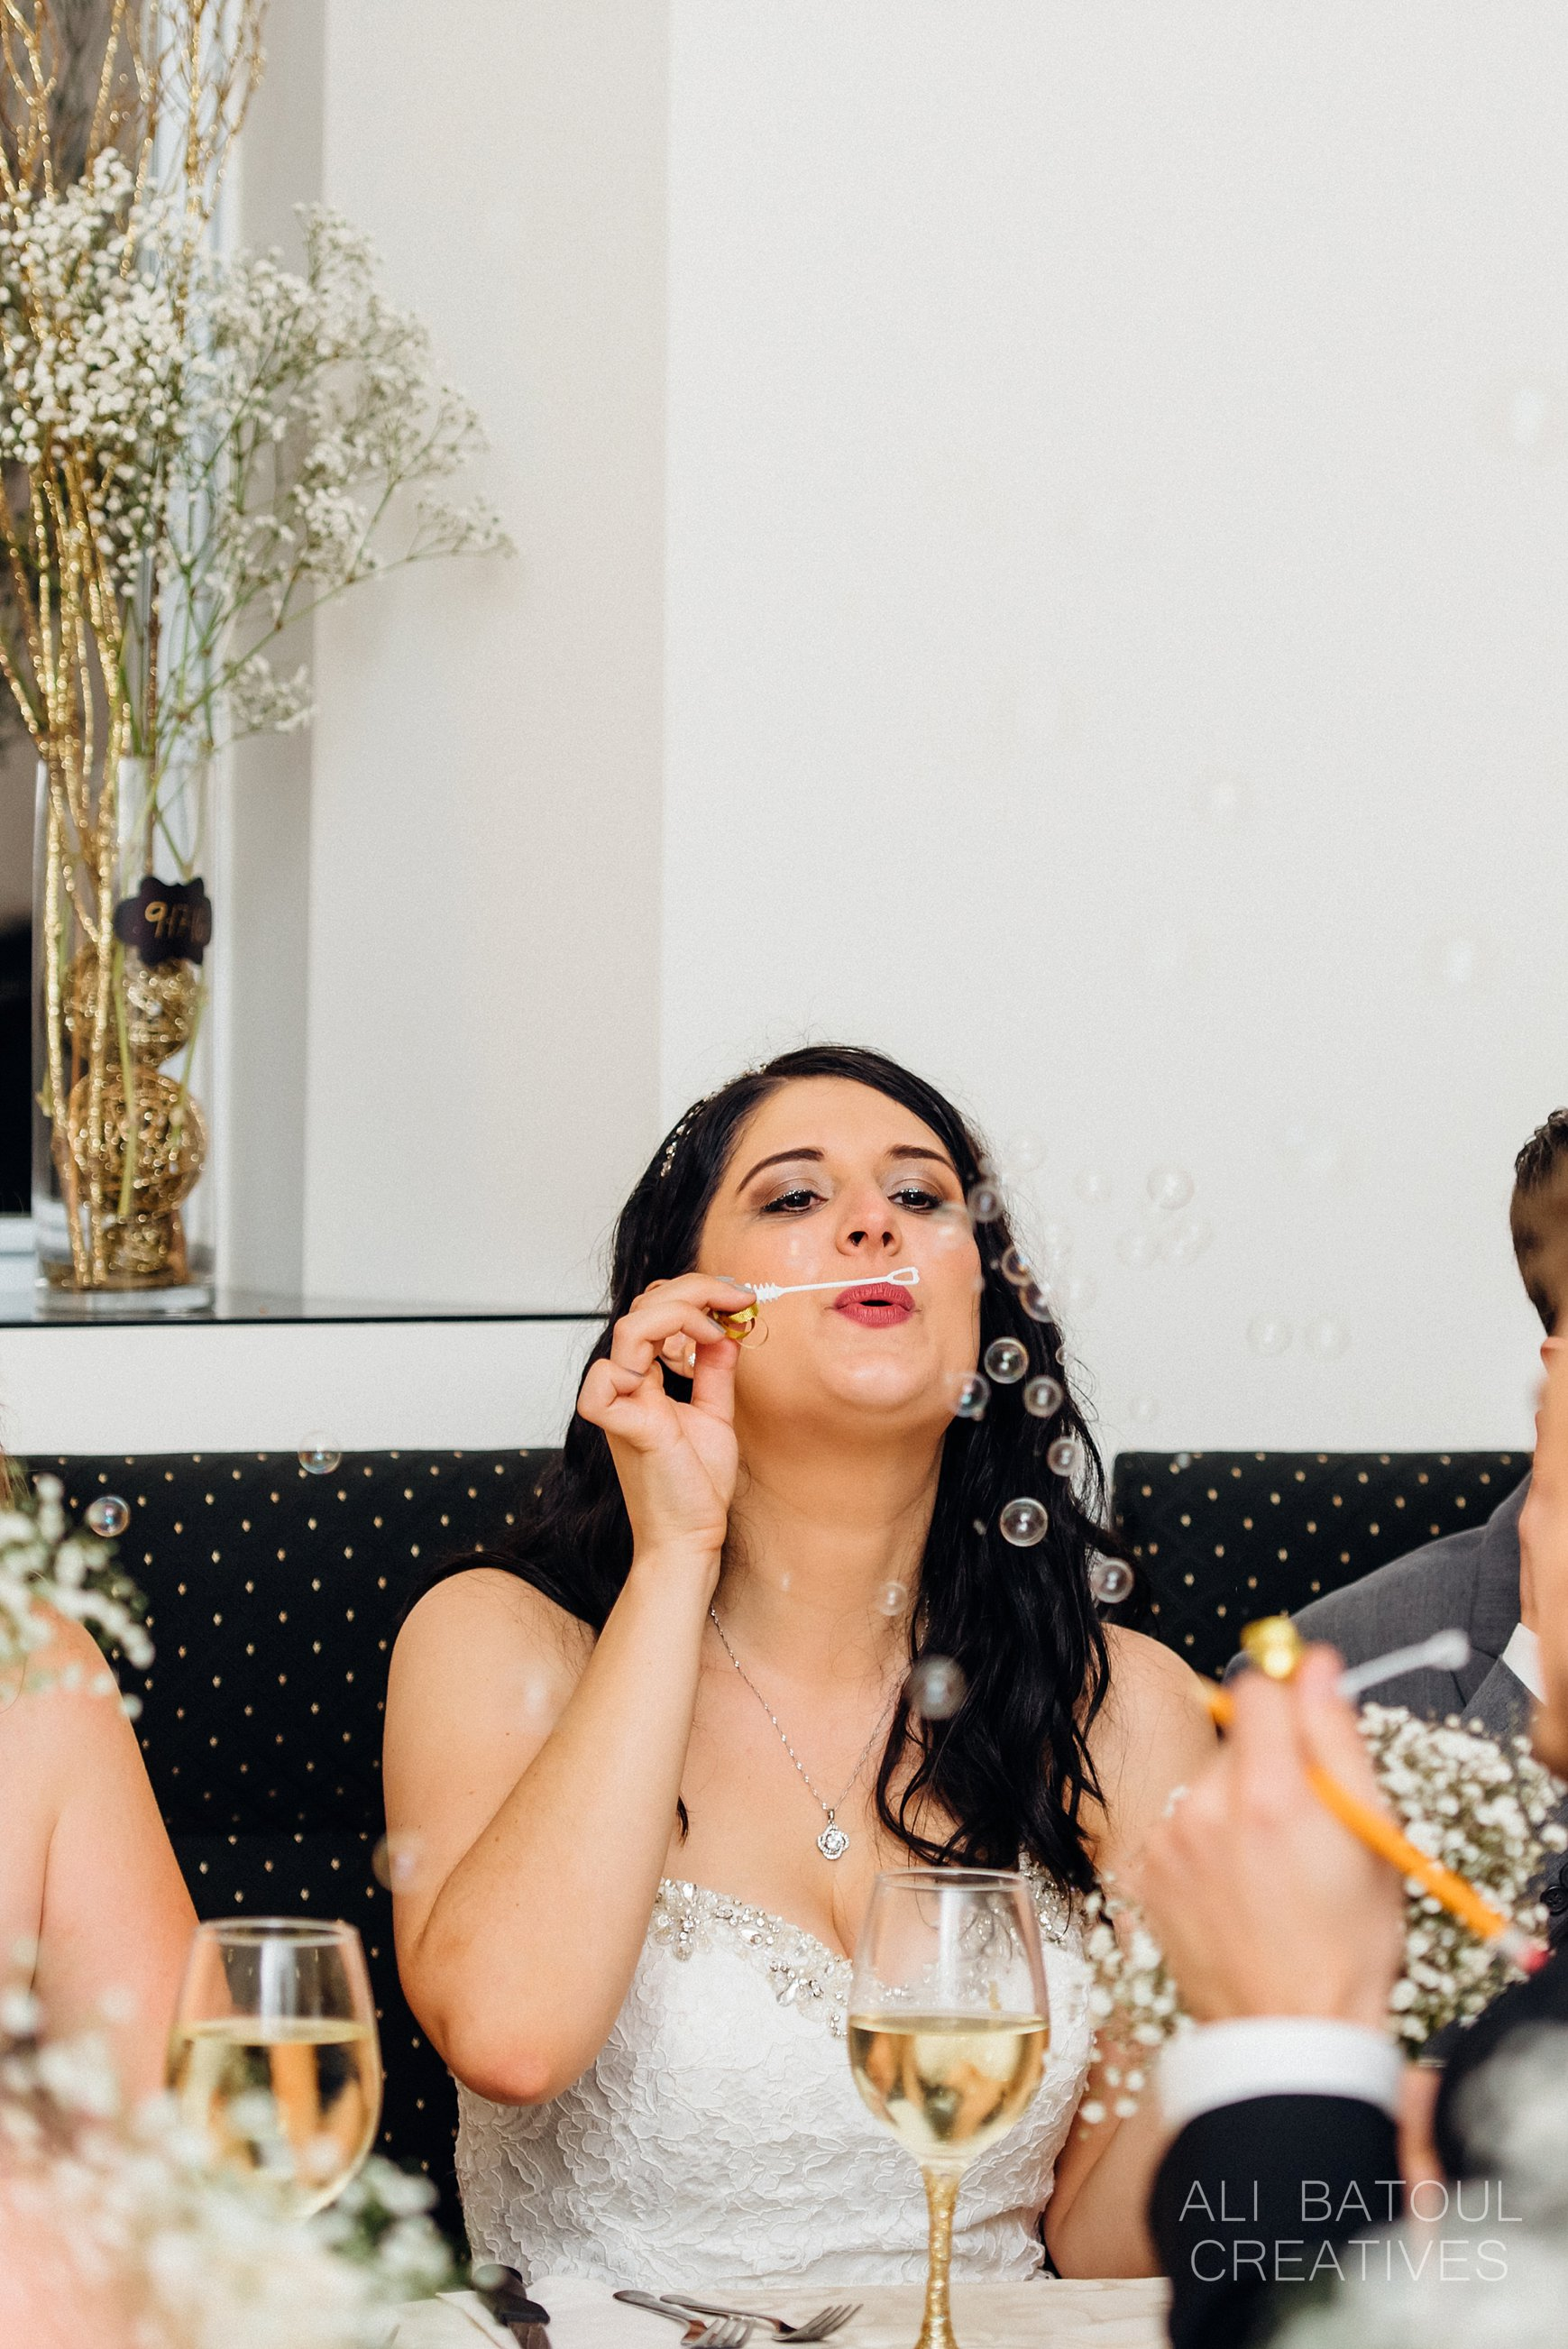 Jocelyn + Steve At The Schoolhouse Wedding - Ali and Batoul Fine Art Wedding Photography_0080.jpg